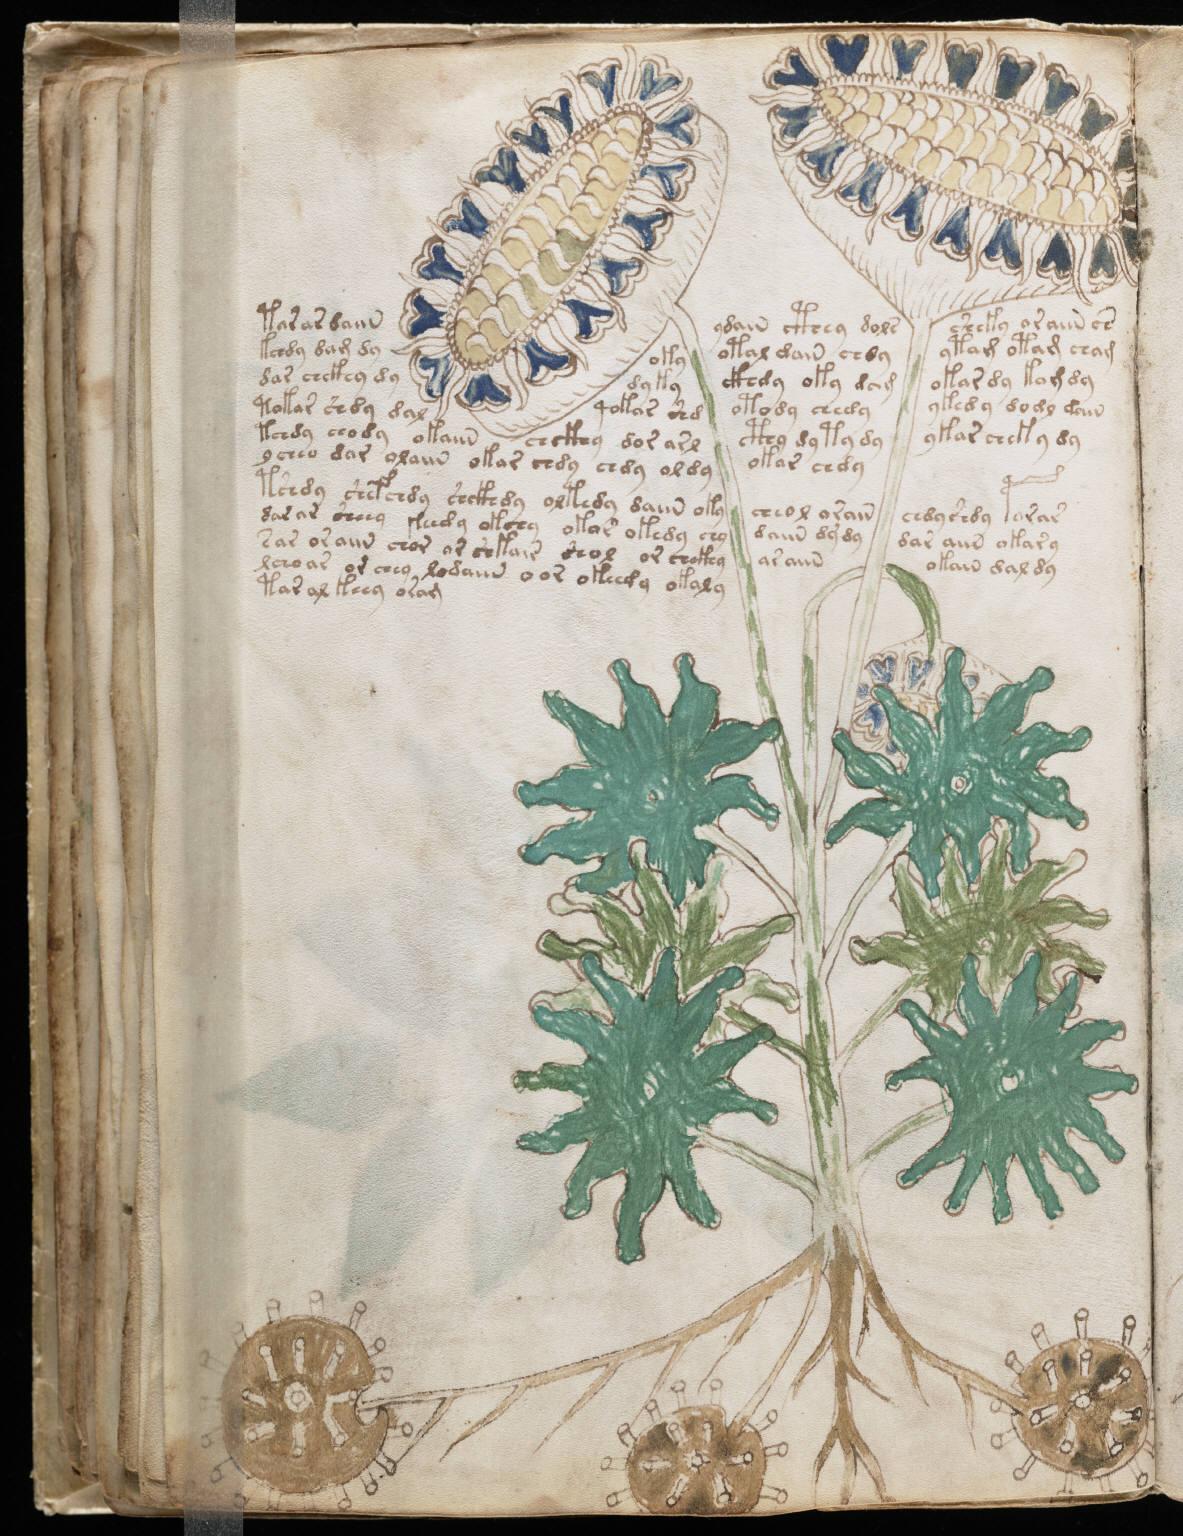 Voynich Manuscript %2866%29 ヴォイニッチ手稿(写本) どの言語にも属さない謎の文字!